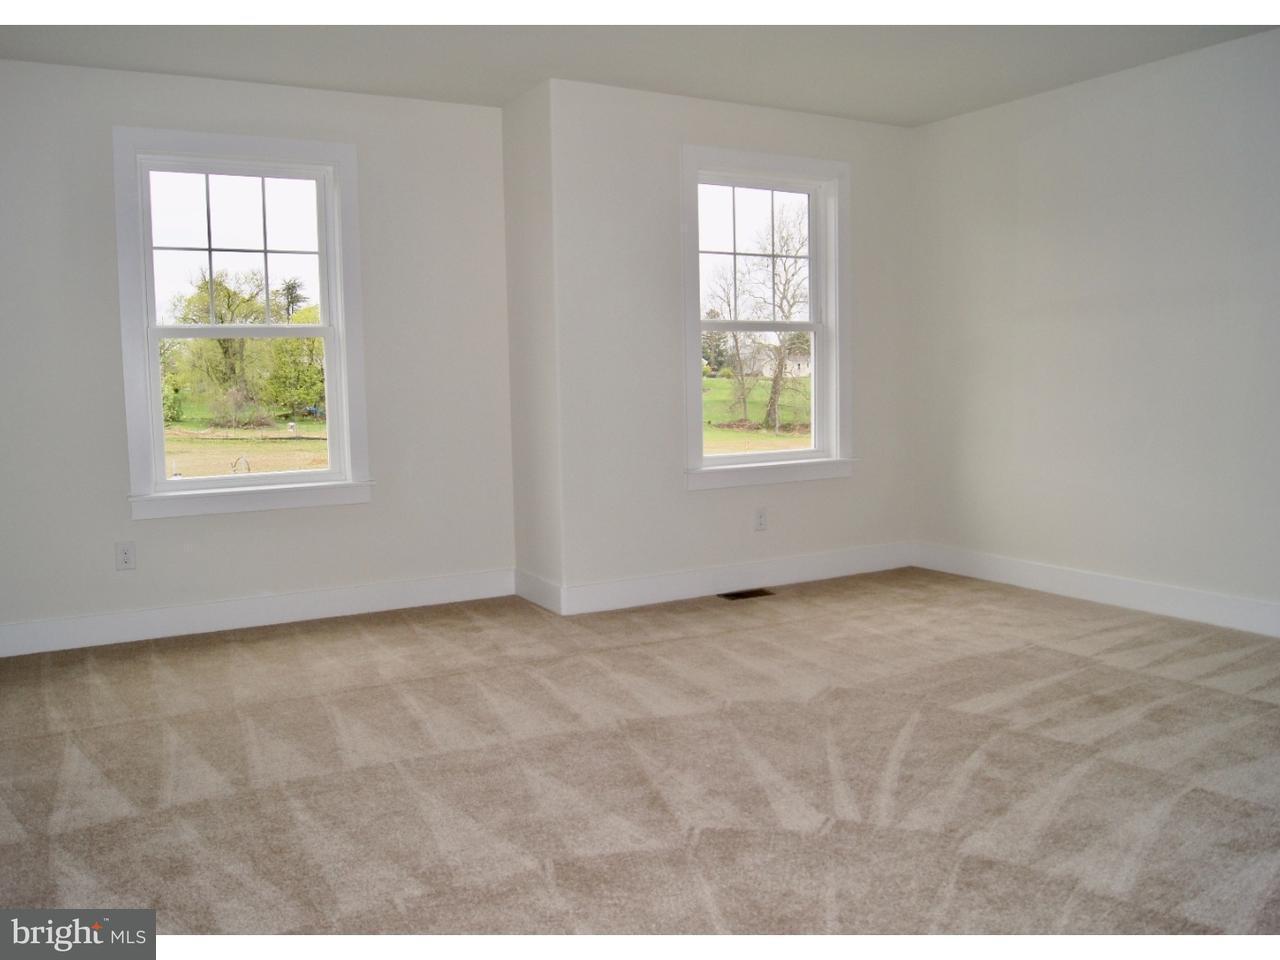 Additional photo for property listing at 154 SALEM WAY  West Grove, Pennsylvanie 19390 États-Unis